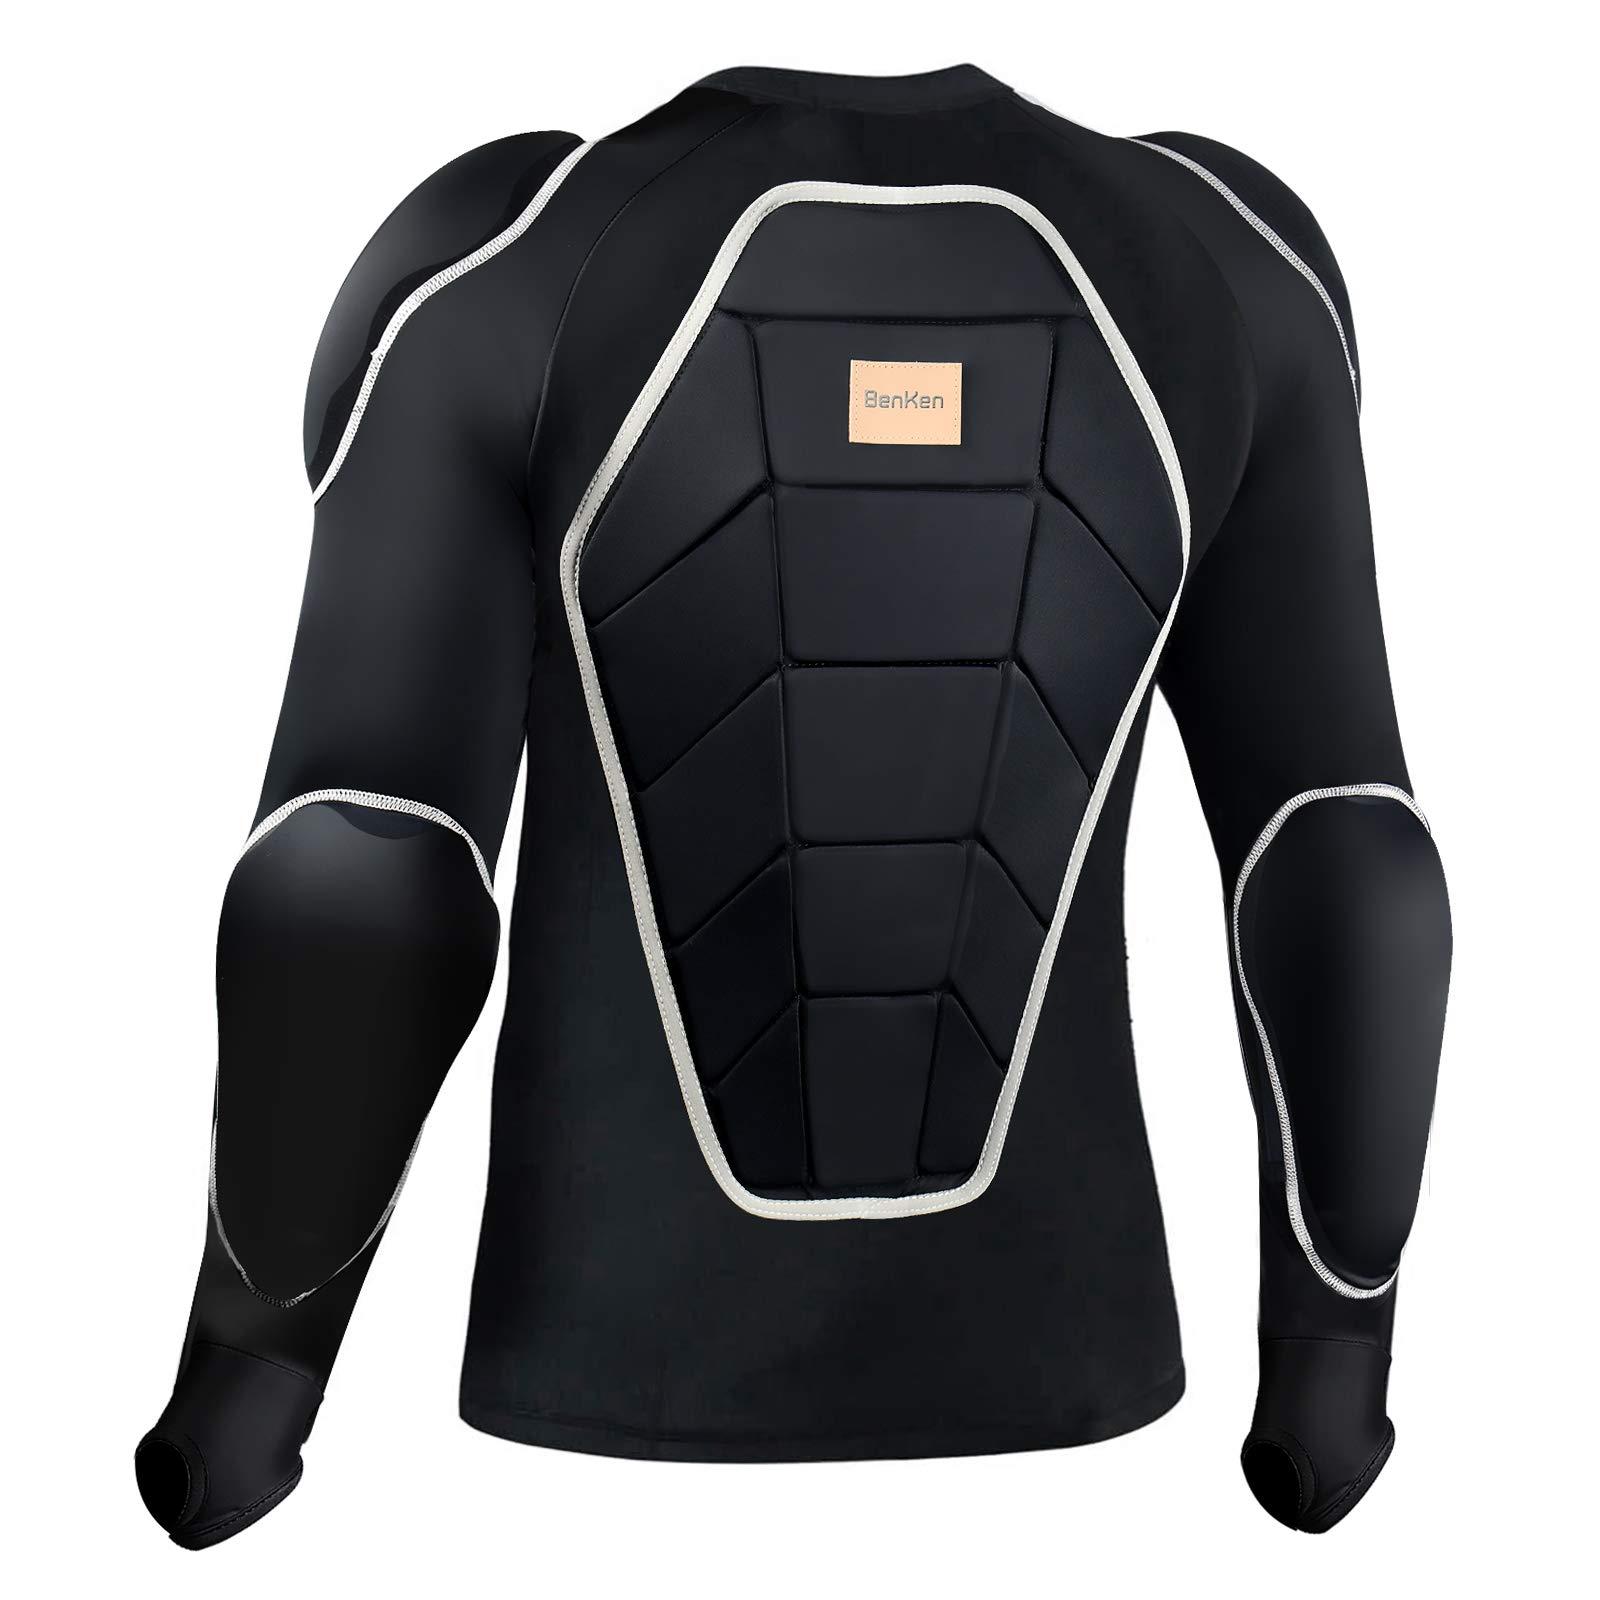 BenKen Motorcycle Armor Chest Shoulder Elbow Protector Protective Gear Protective Jacket Skateboard Snowboarding Protection